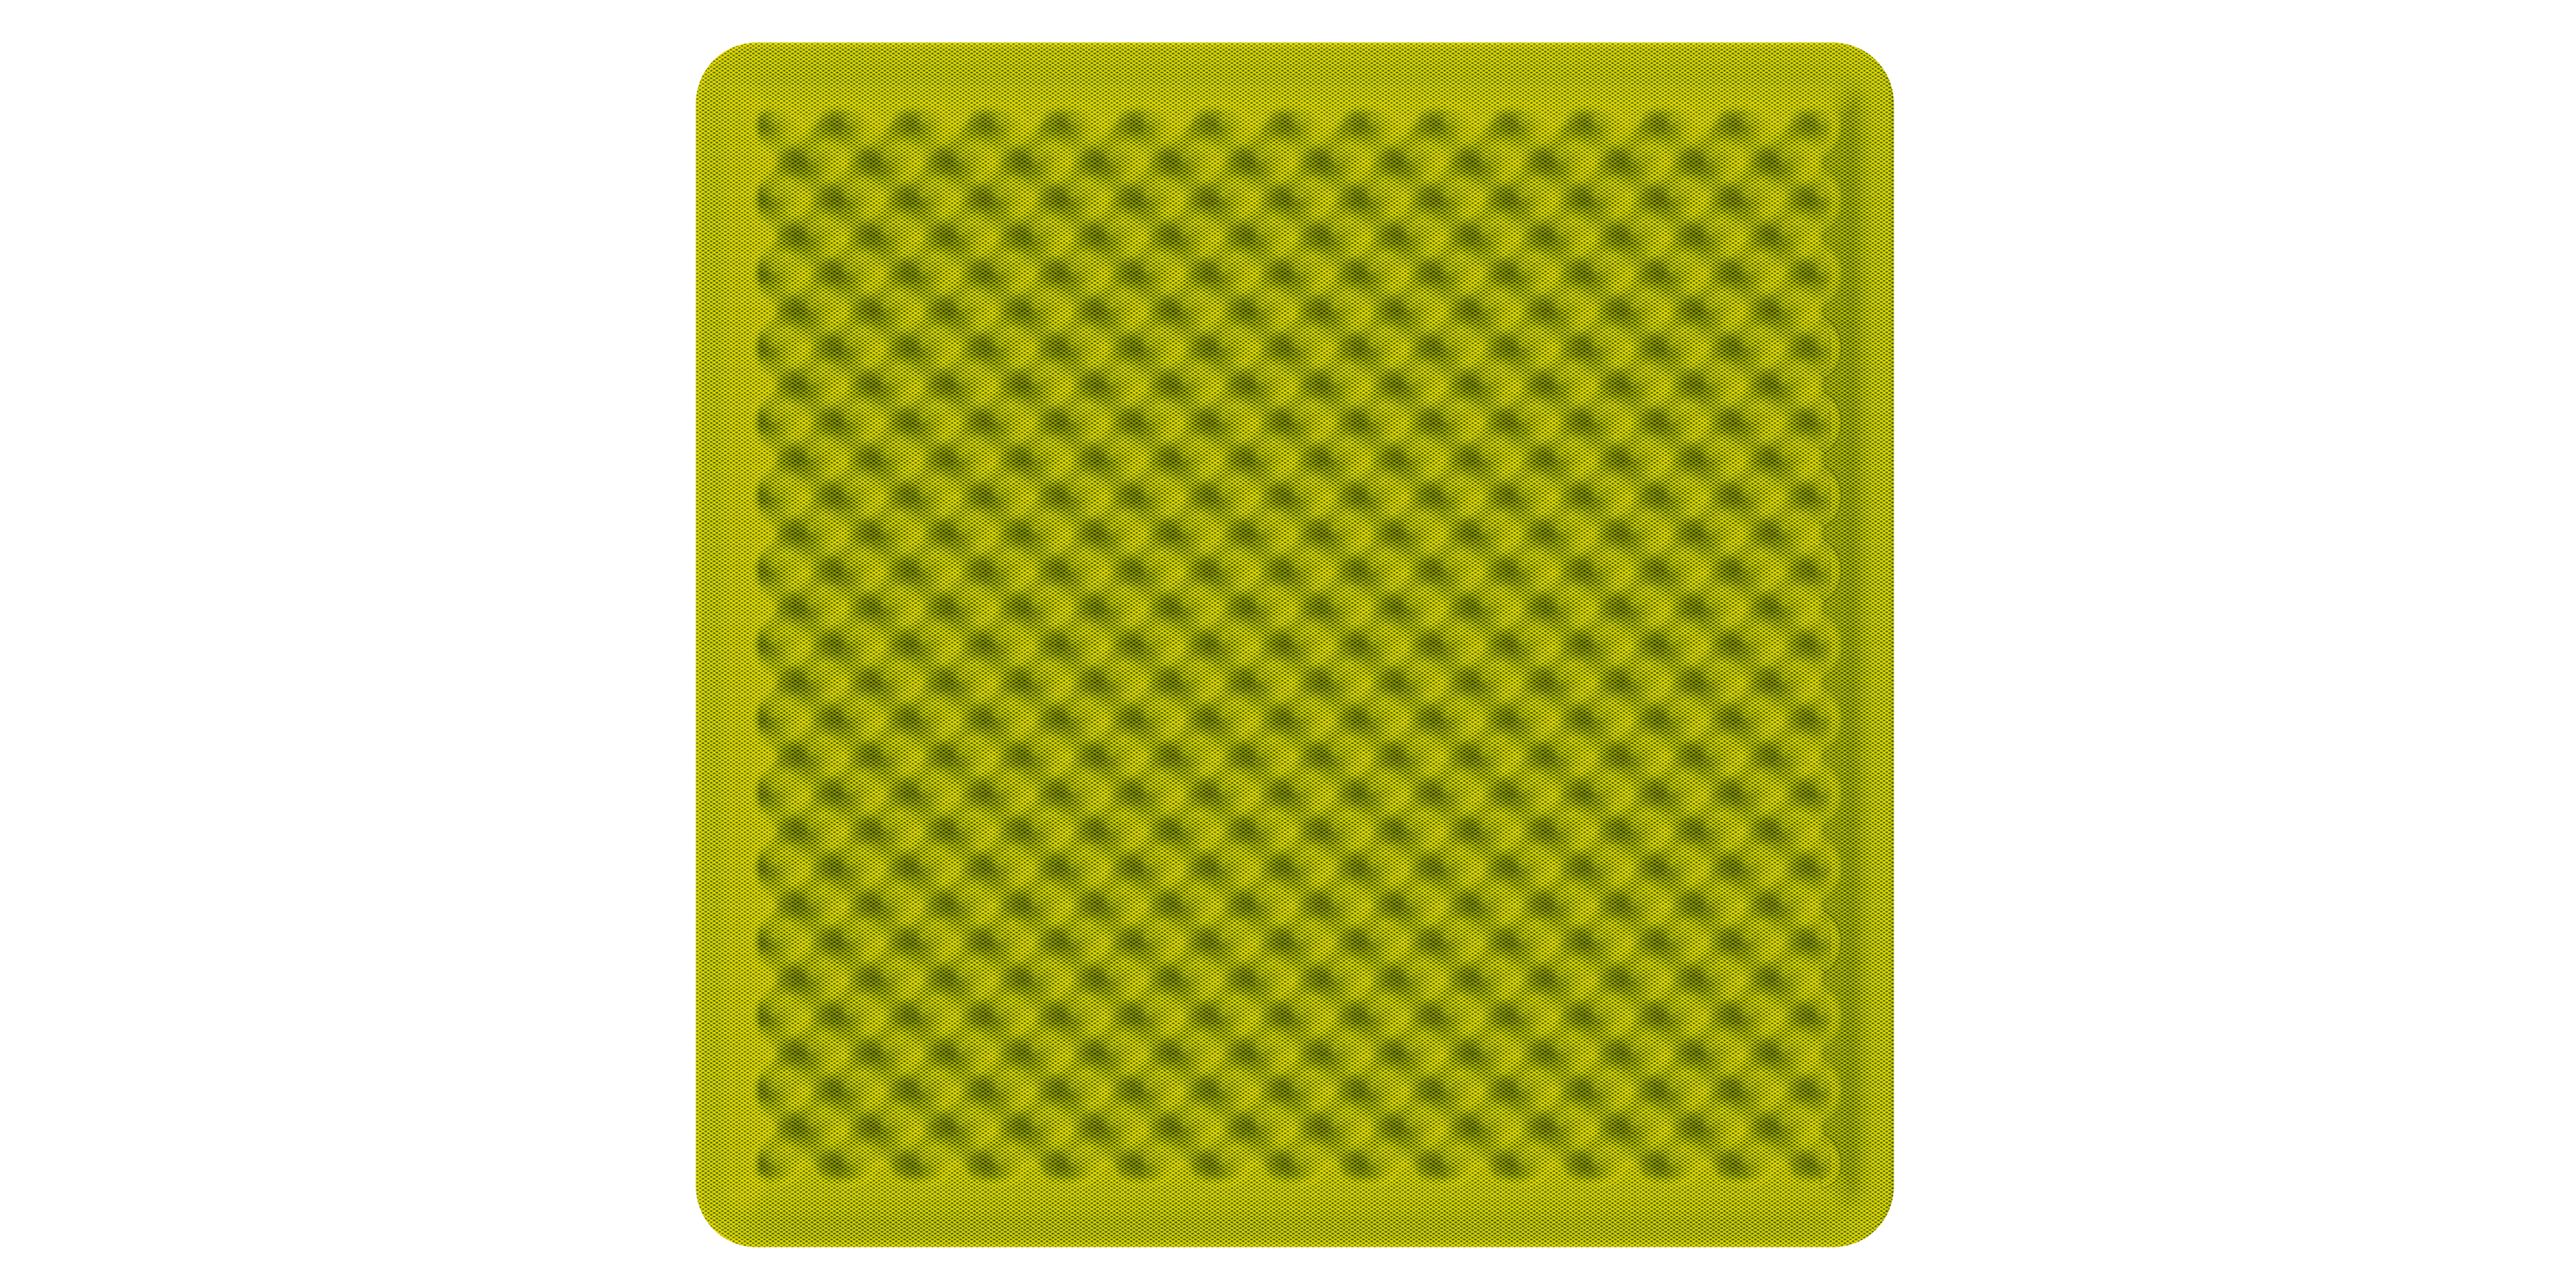 Artemide Akustikpanel Schallabsorbierend EGGBOARD WALL SUSP./CEILING ACOUSTIC PANEL 80x80 GREEN